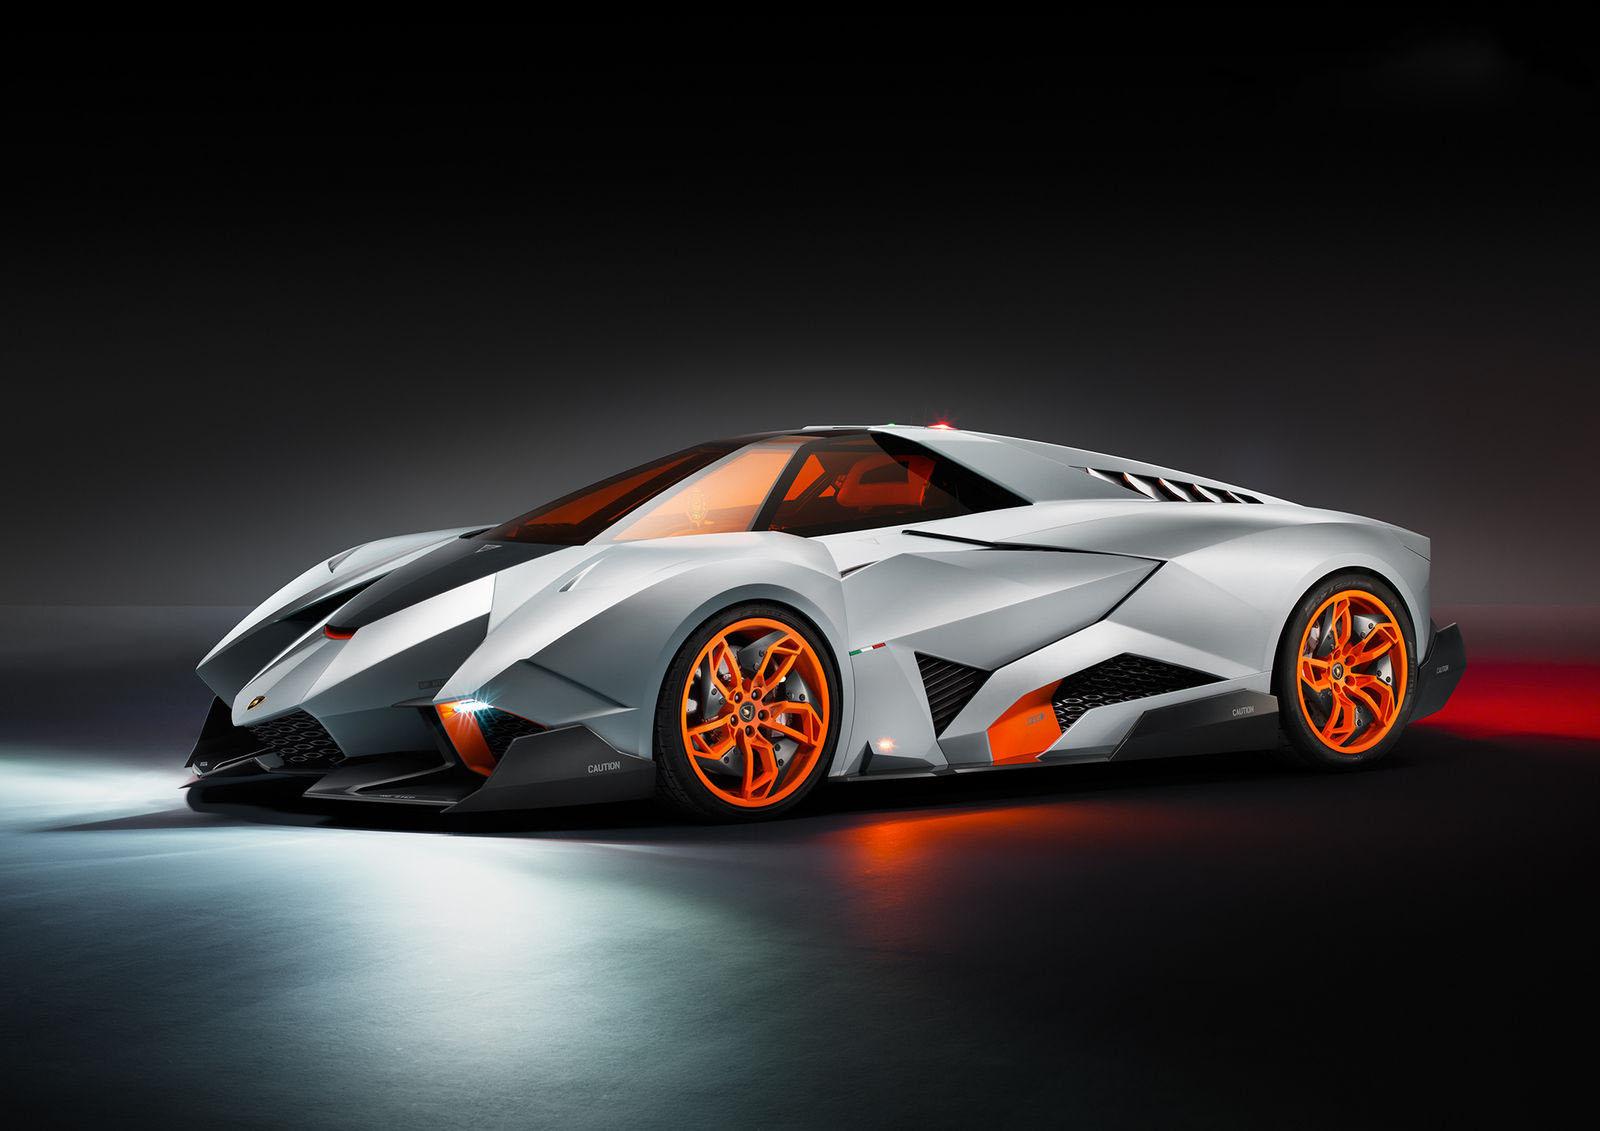 automovel Lamborghini Egoista 2013